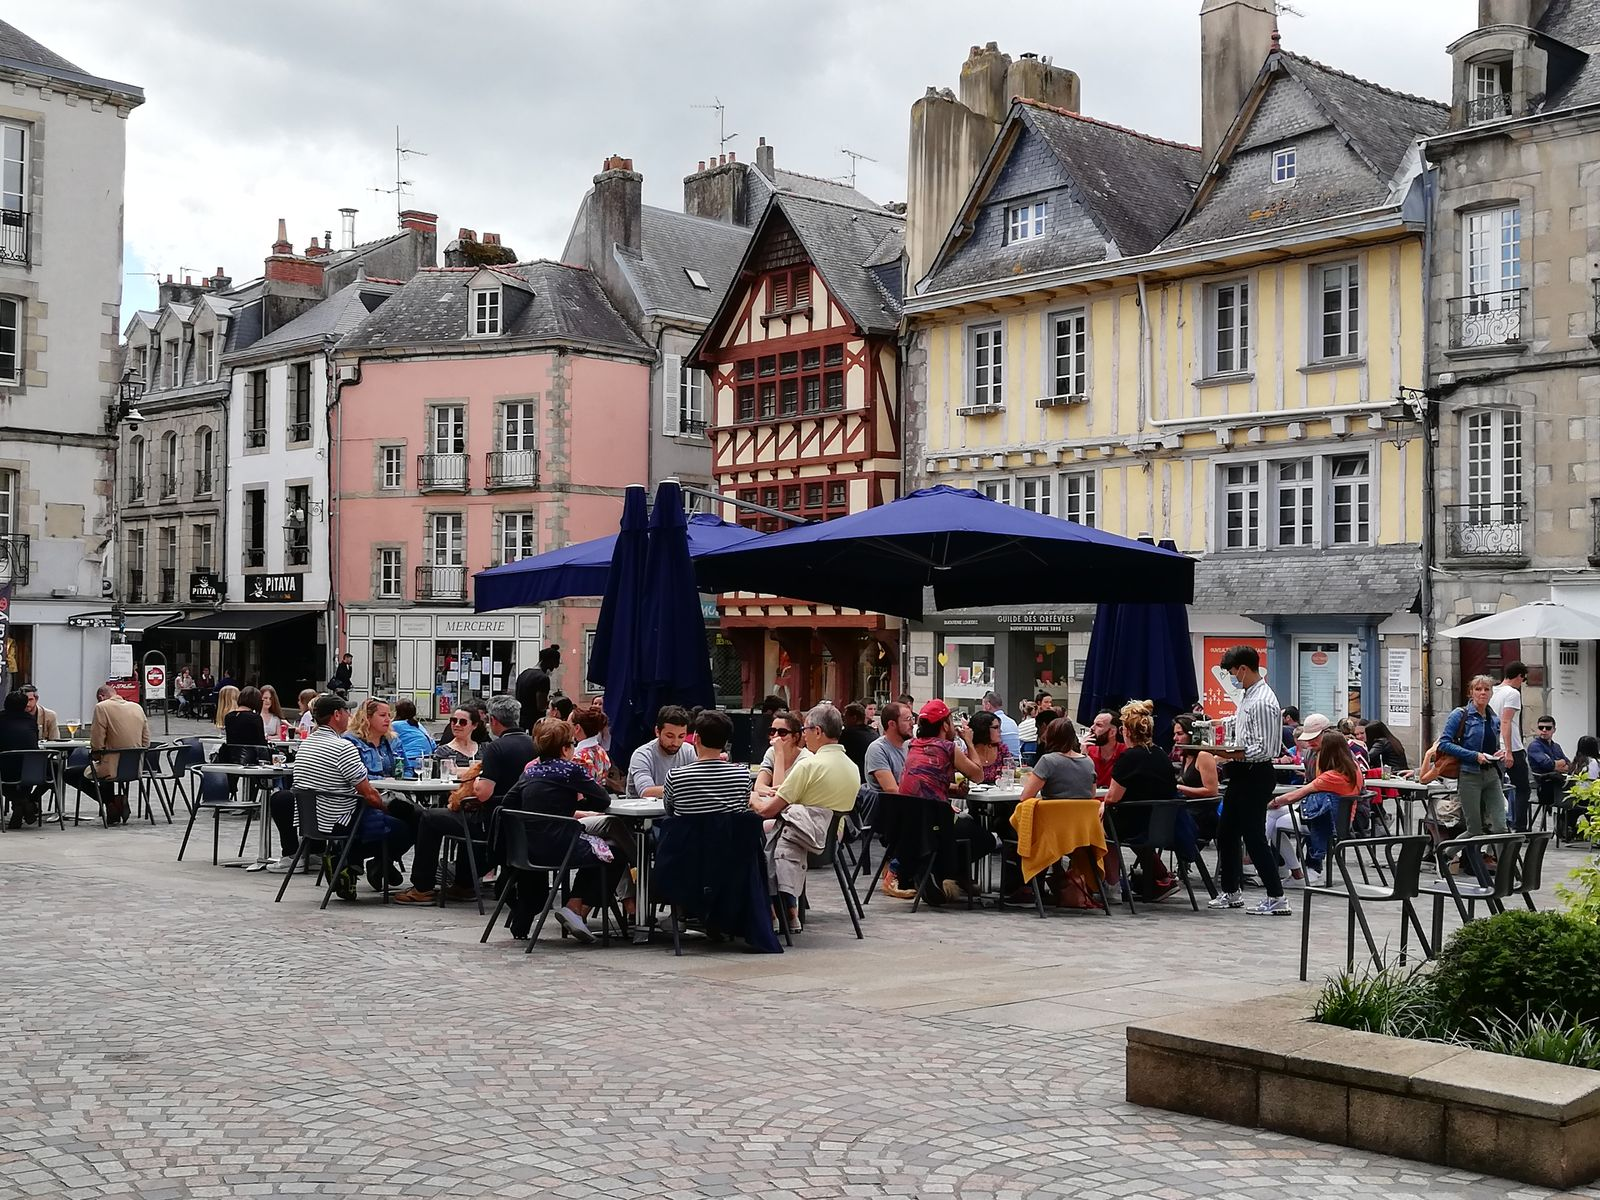 Terrasse Place Terre au Duc Quimper